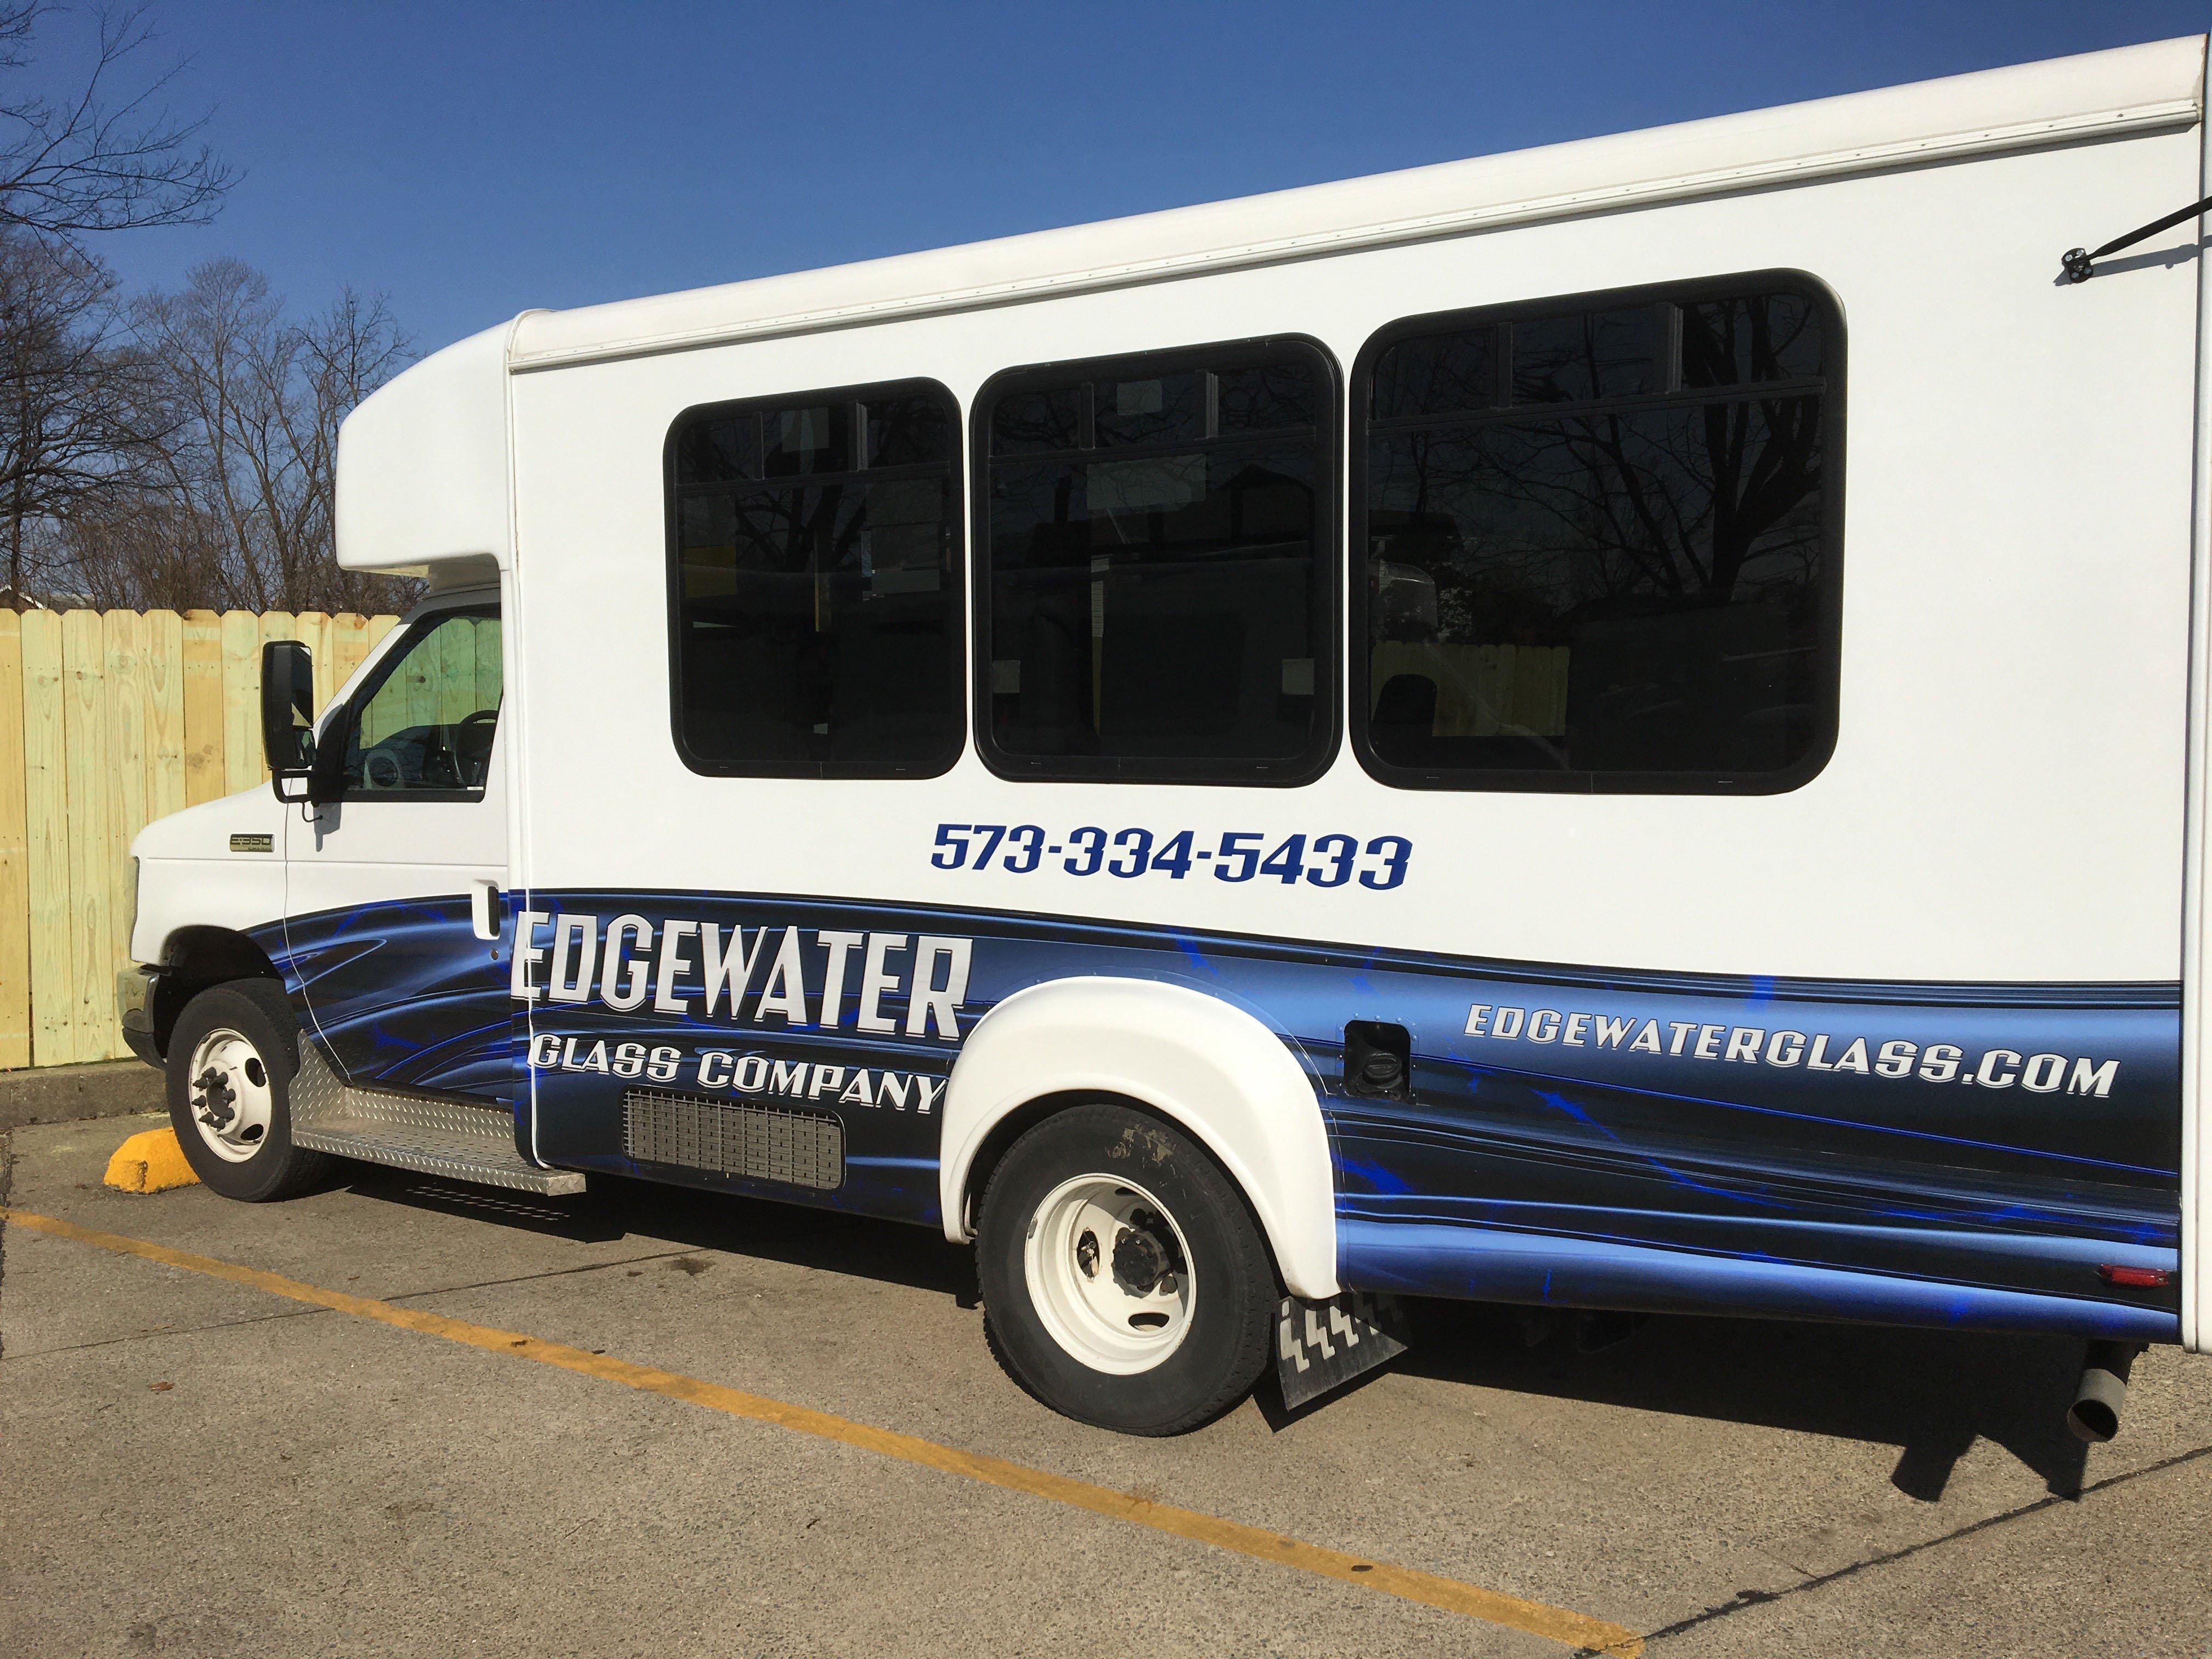 Cape Girardeau County Transit Authority vehicle